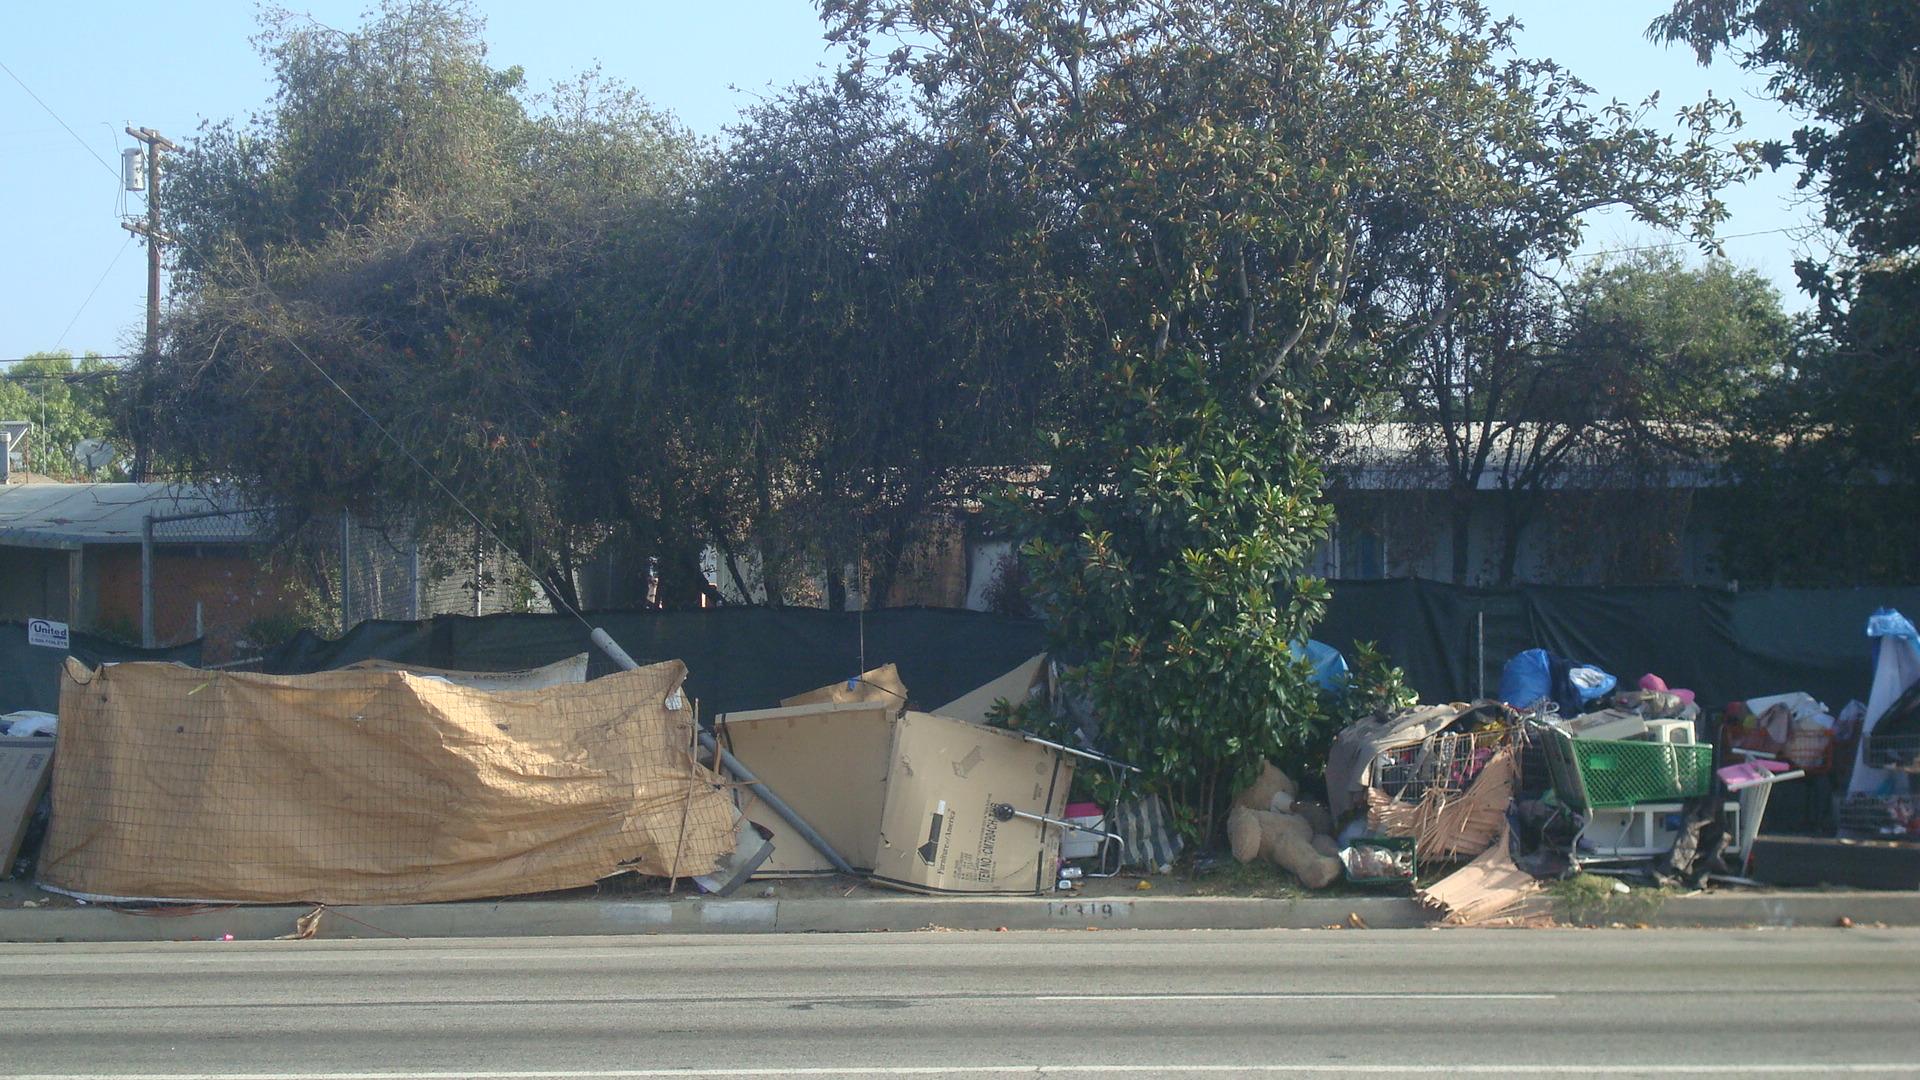 Homeless encampment near Roscoe and Lennox.